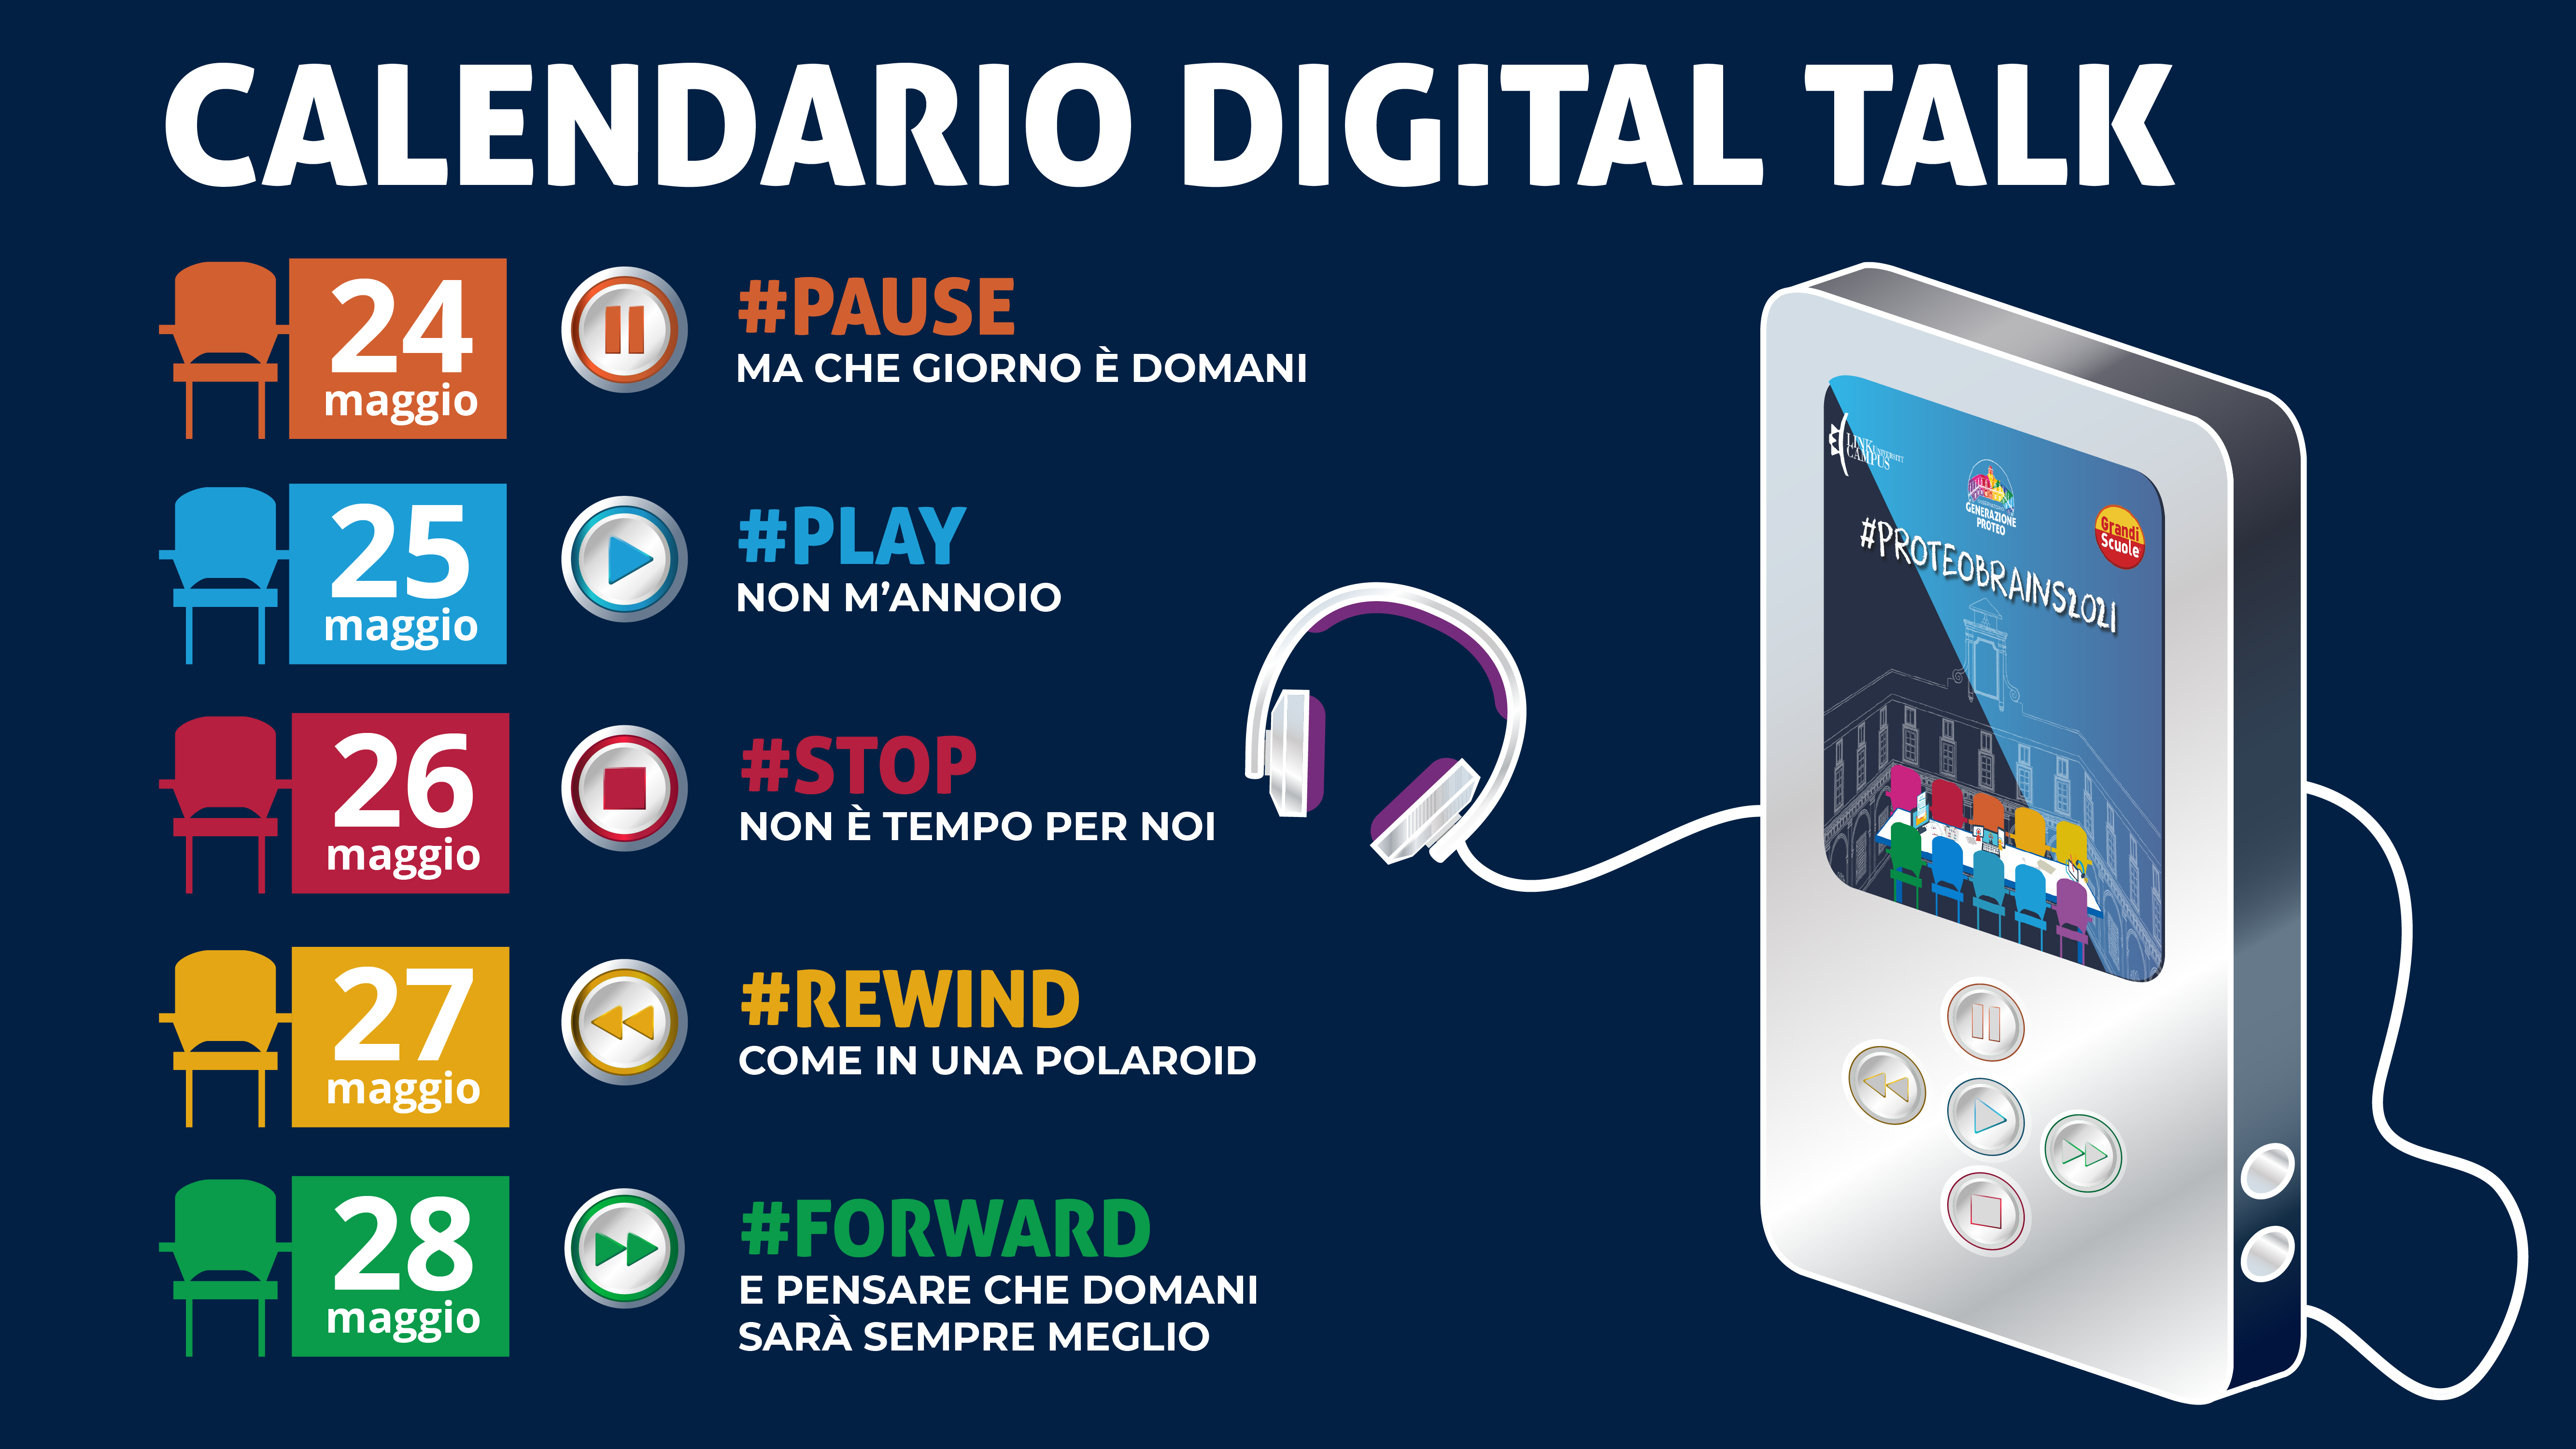 Calendario Digital Talk #ProteoBrains2021